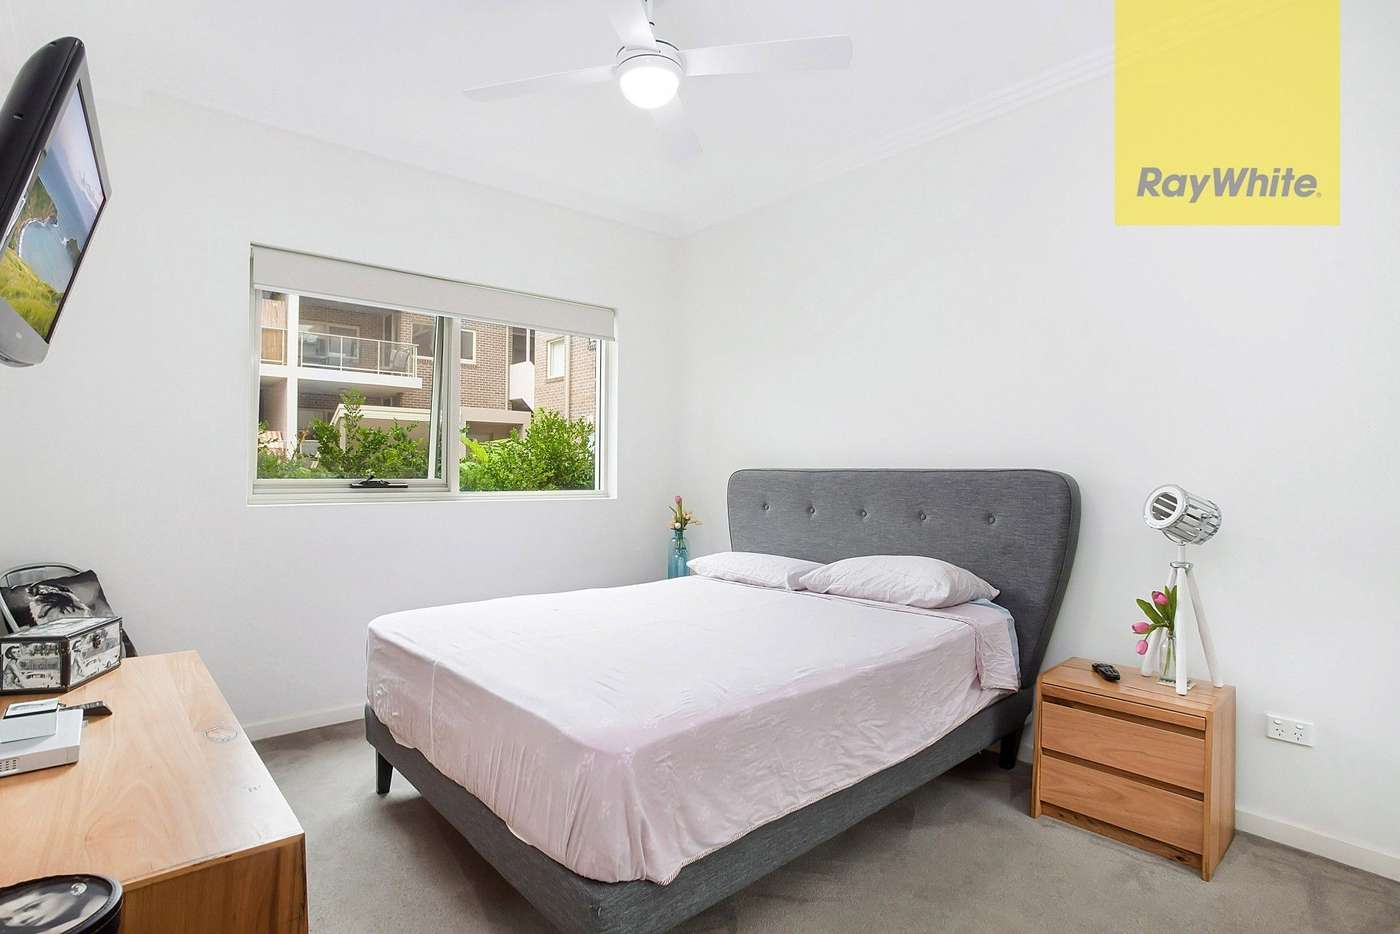 Sixth view of Homely unit listing, 7/93-95 Thomas Street, Parramatta NSW 2150